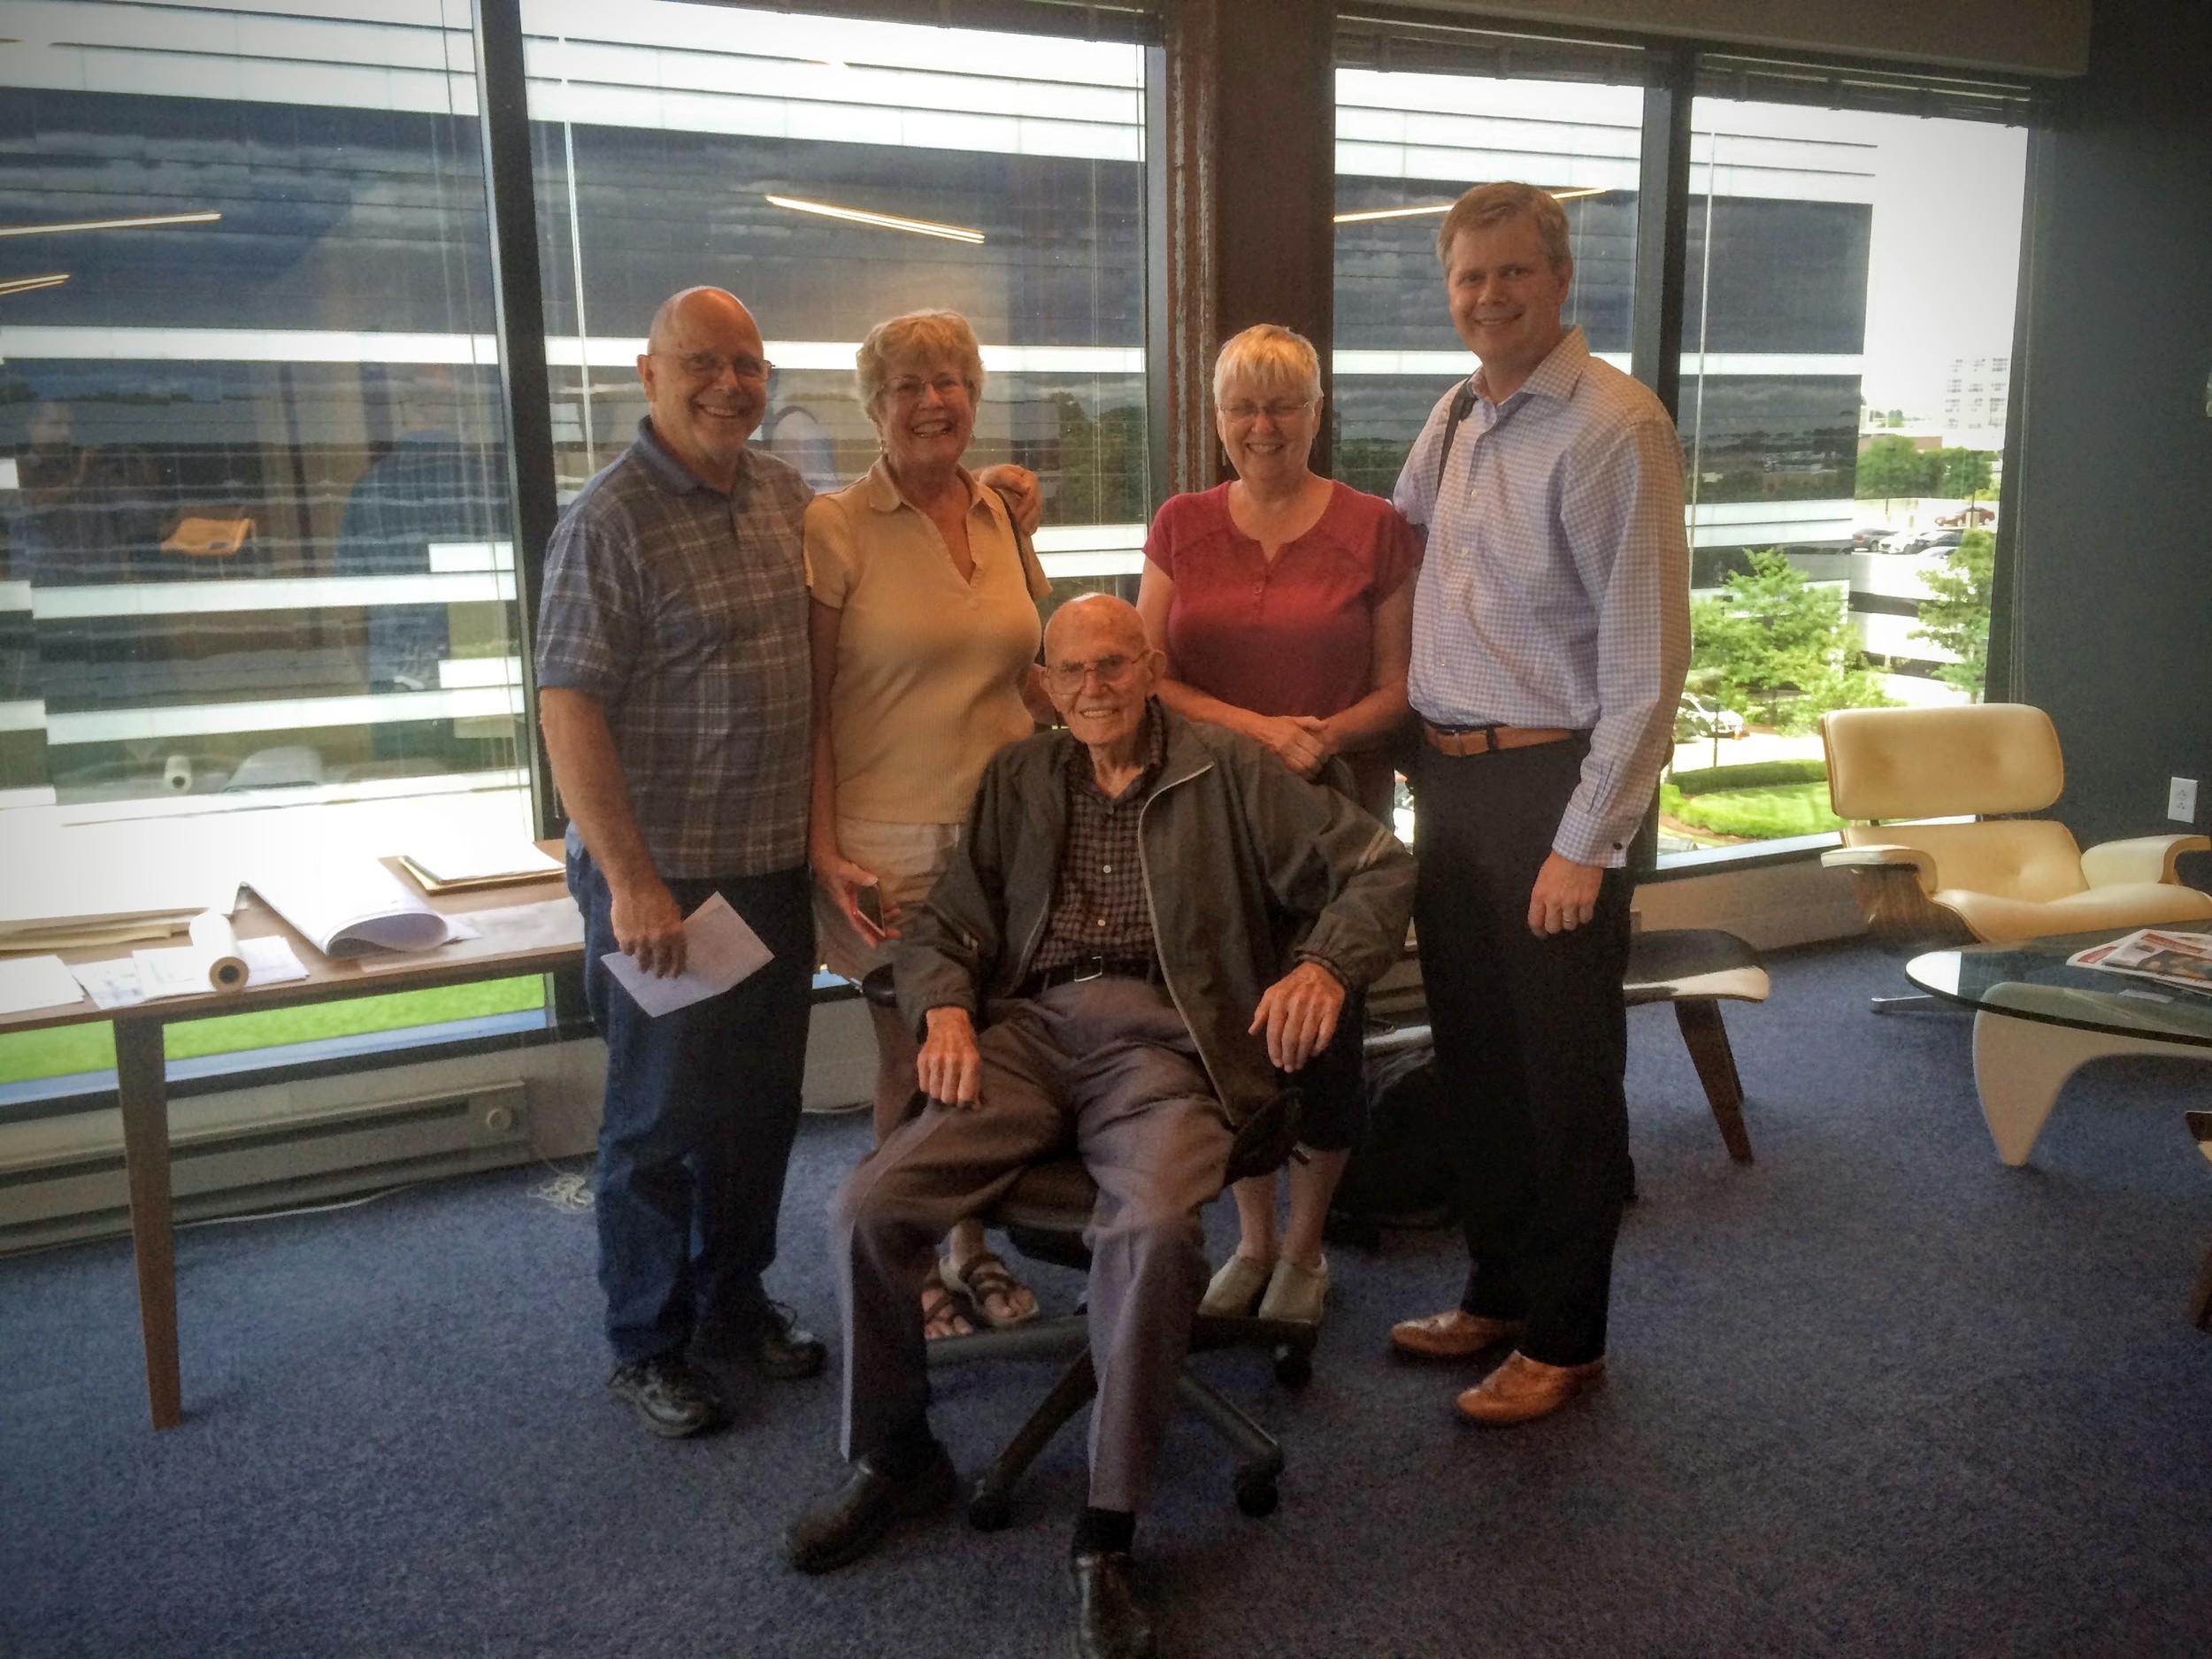 Grandpa Elliott visiting Vessel's office at 103 years old!